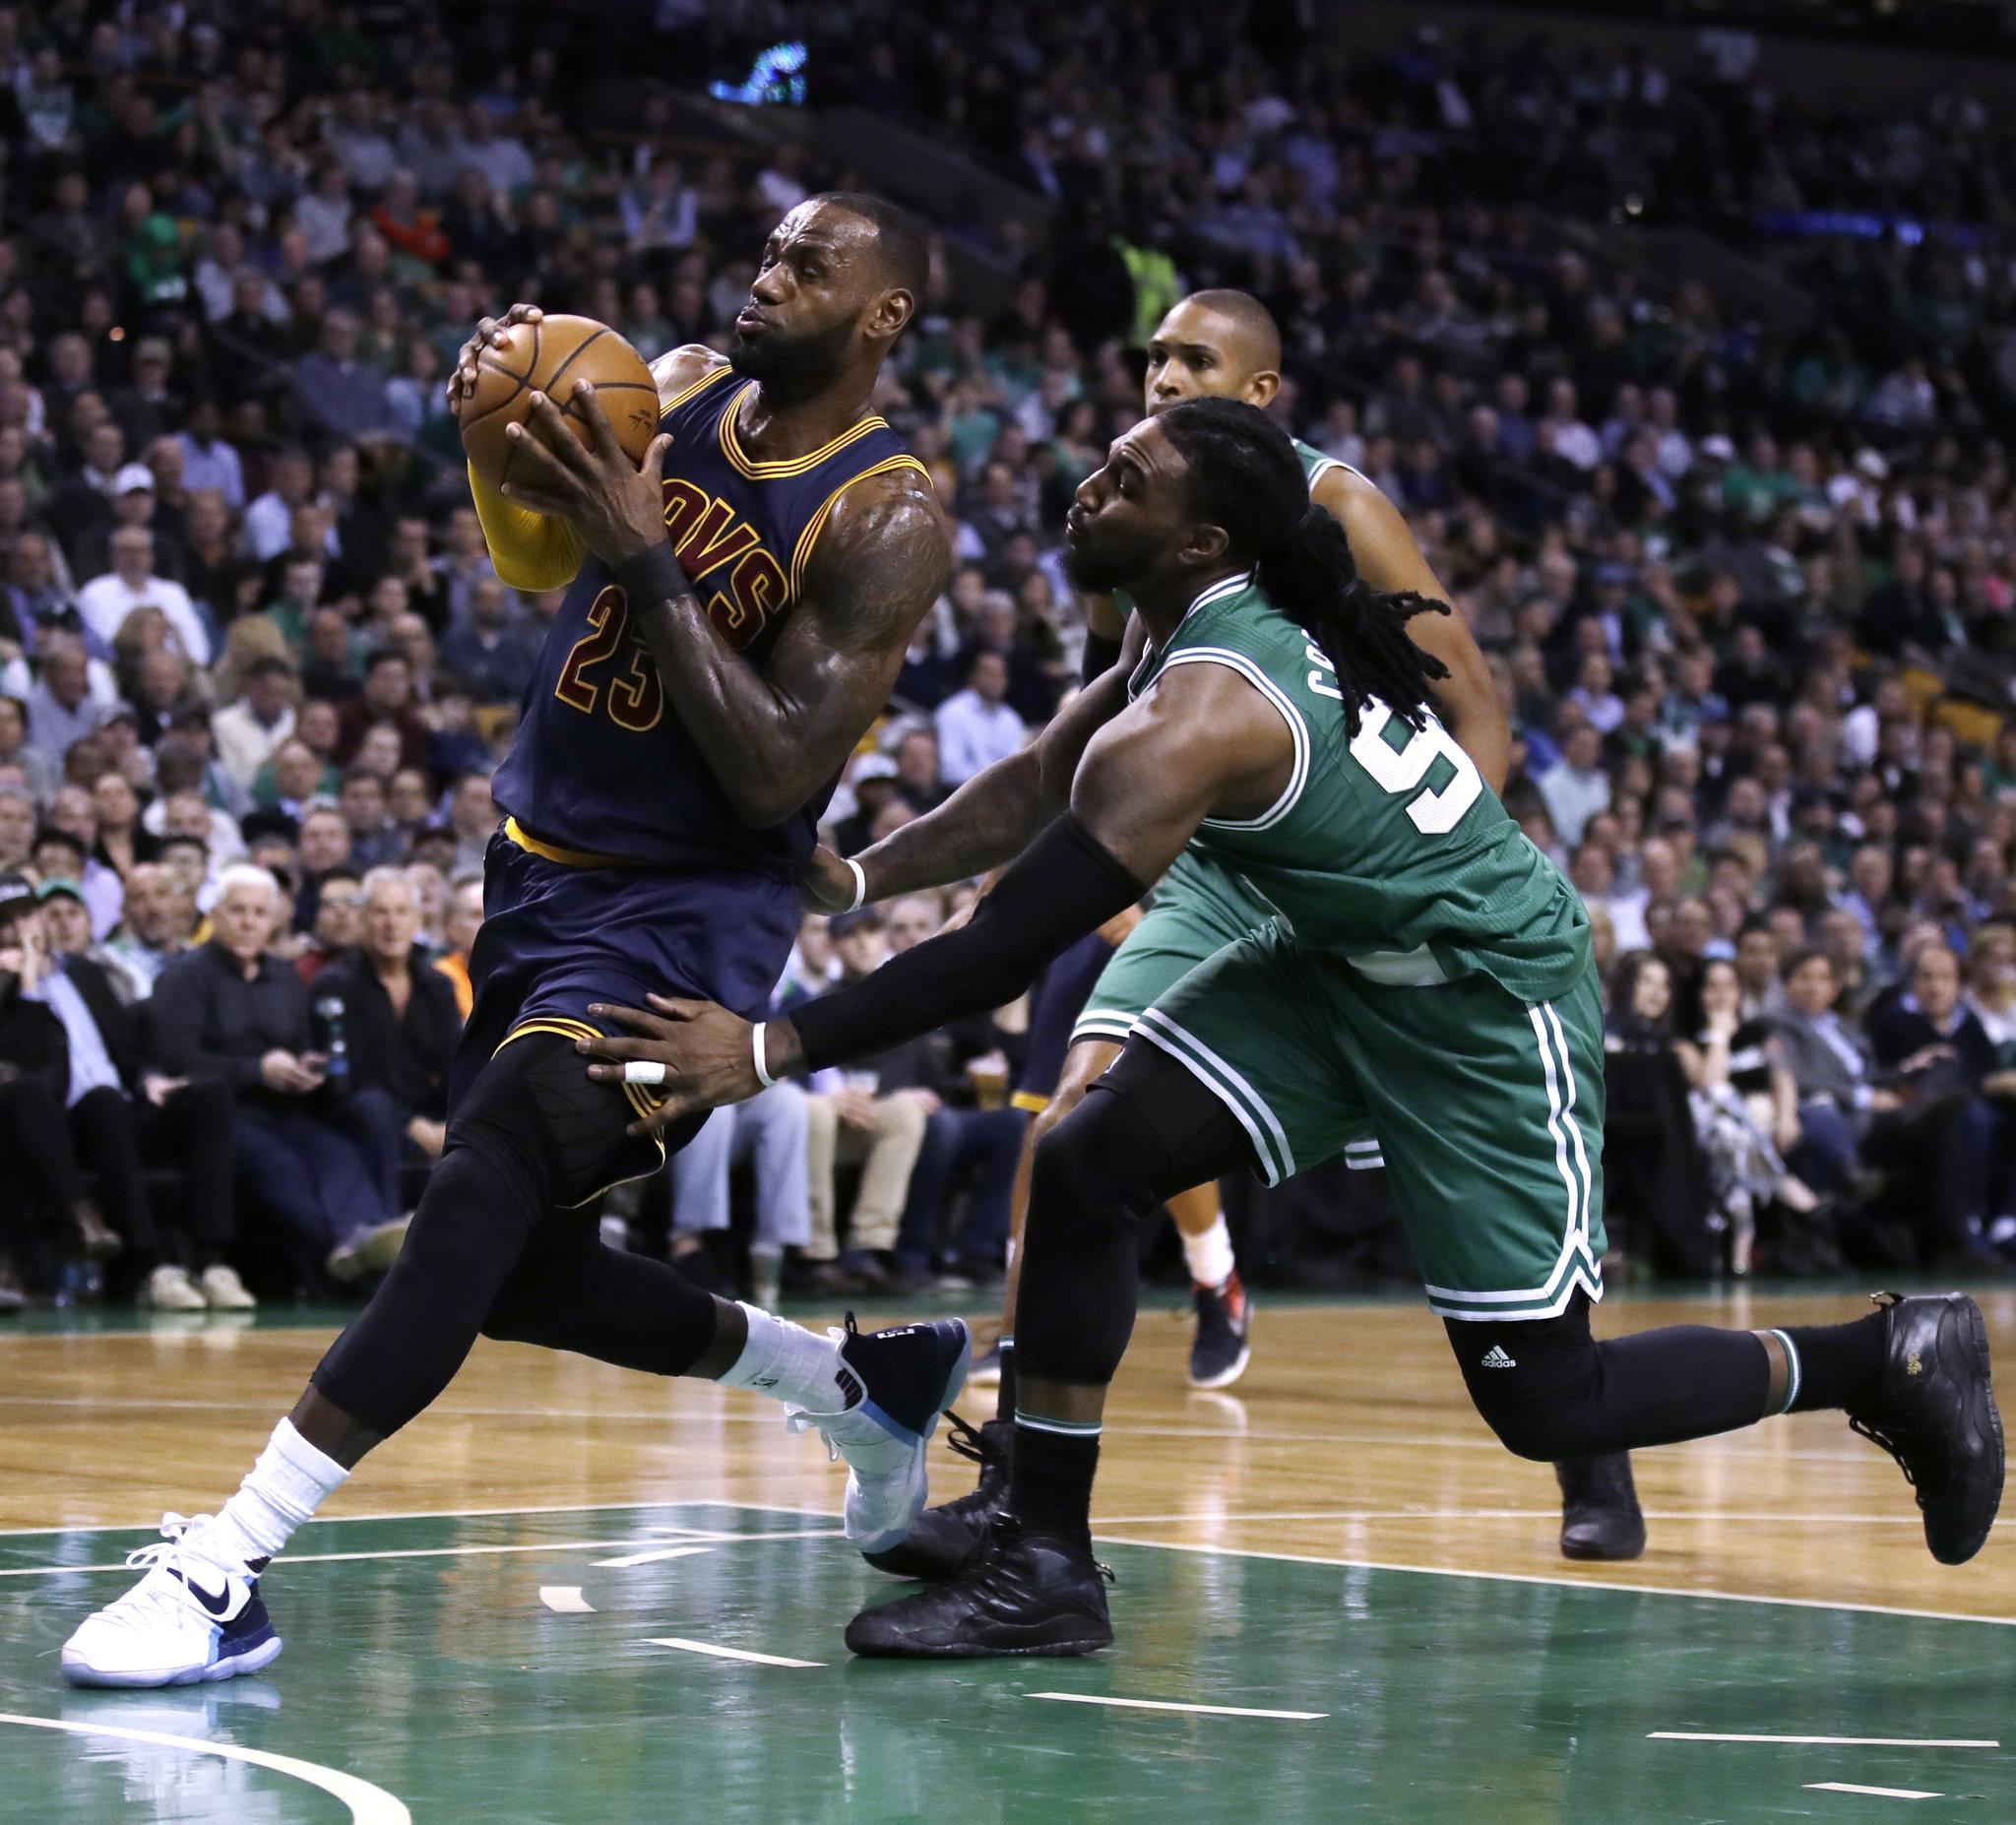 Boston Celtics VS Cleveland Cavaliers  BETTING TIPS (18-05-2017)